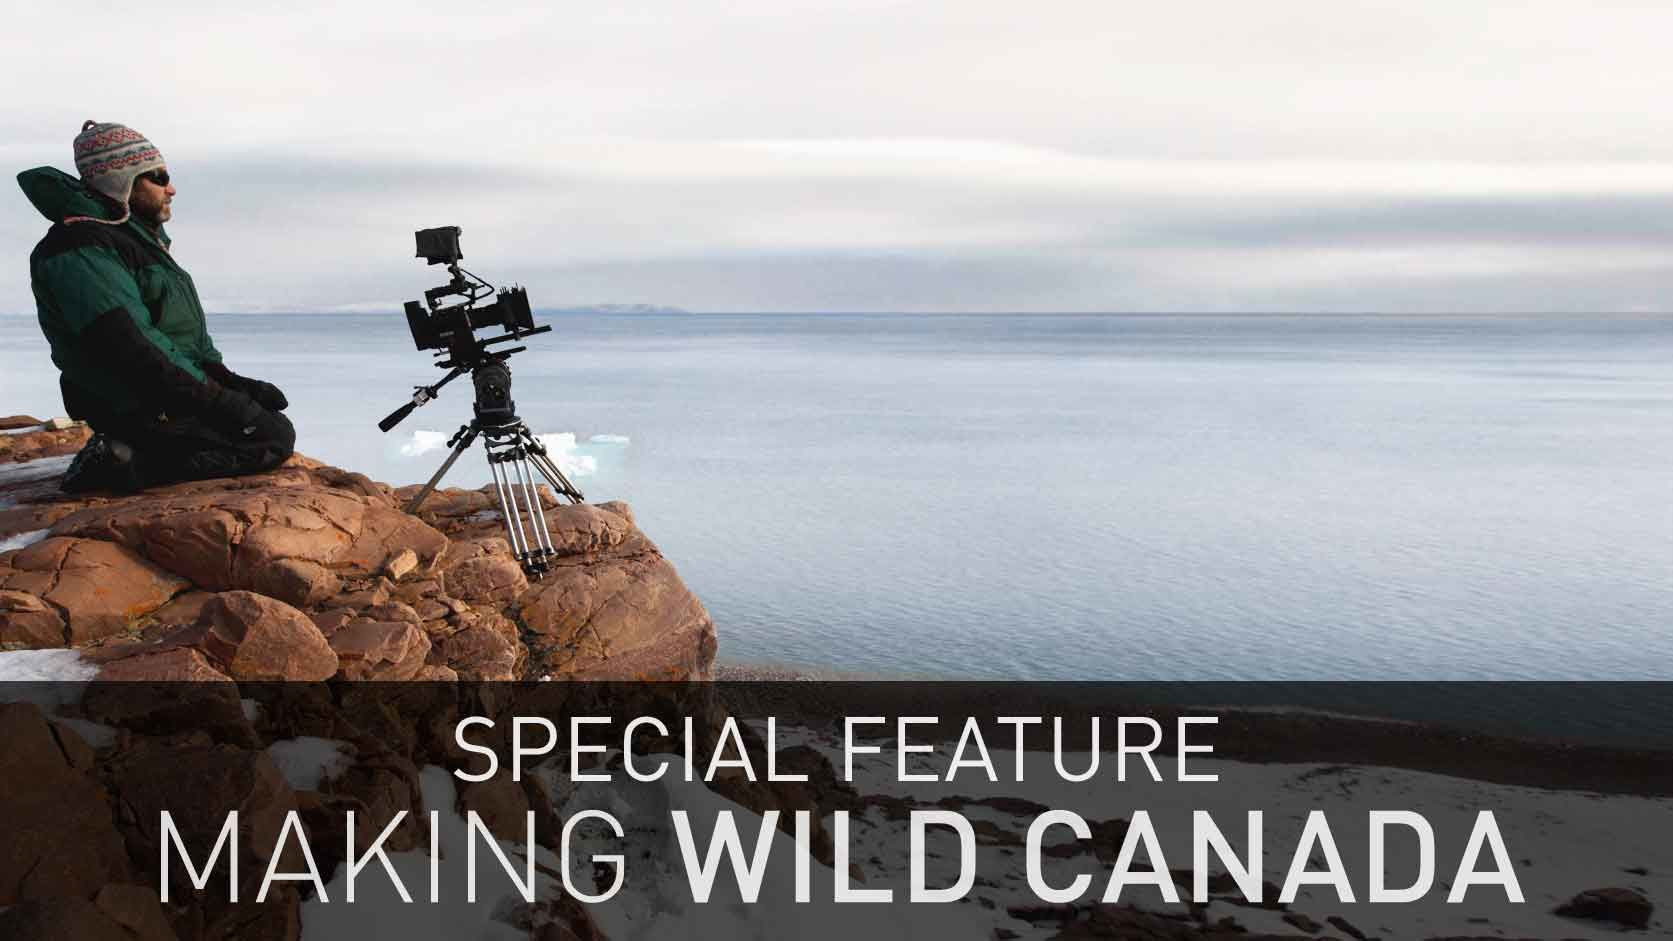 Wild Canada — s01 special-1 — Making Wild Canada